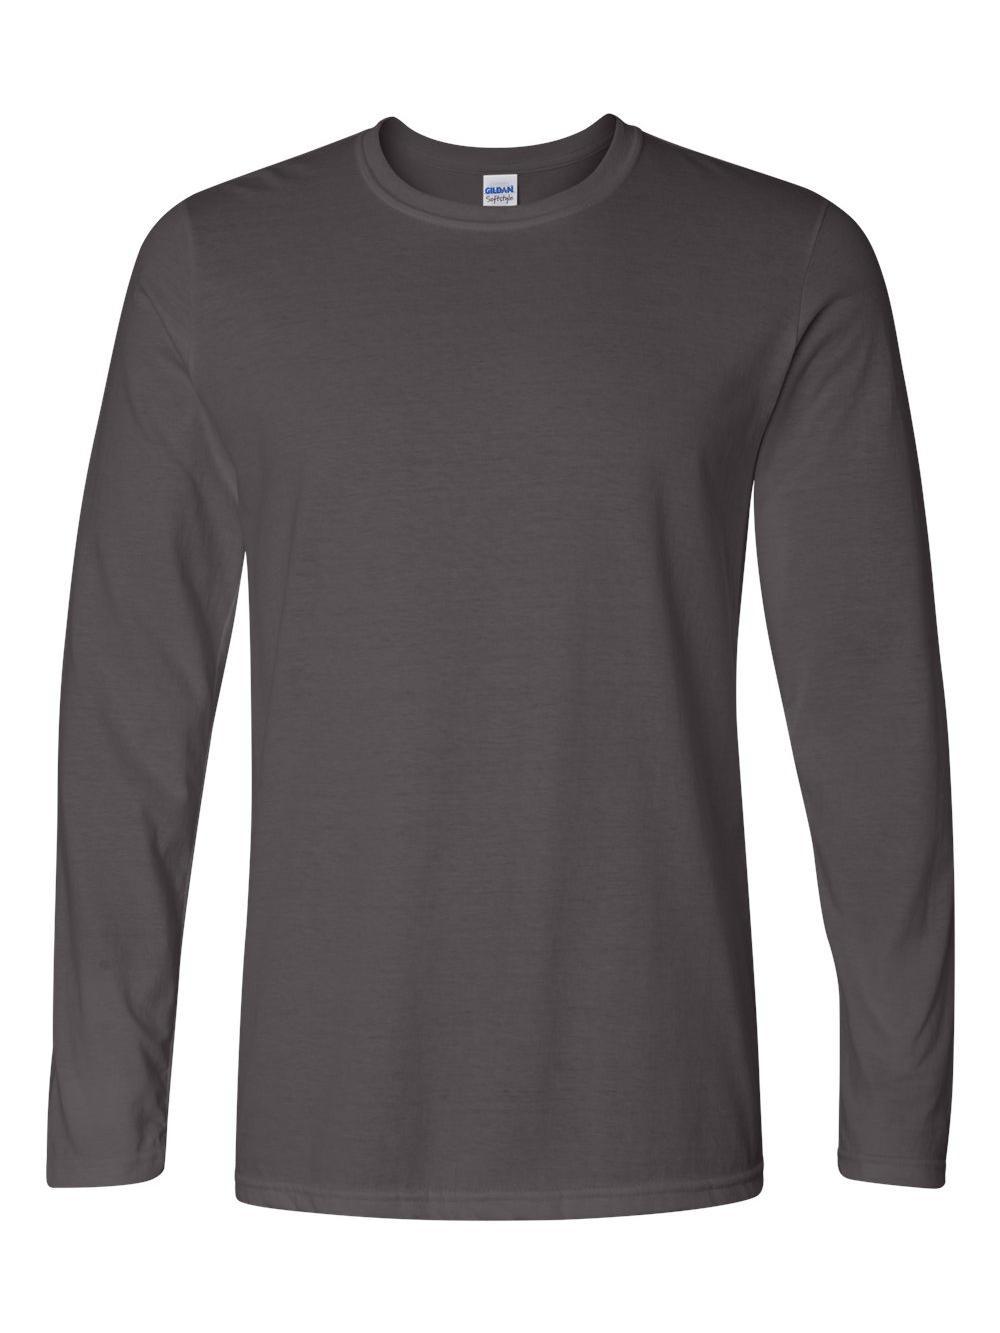 Gildan-Softstyle-Long-Sleeve-T-Shirt-64400 thumbnail 6